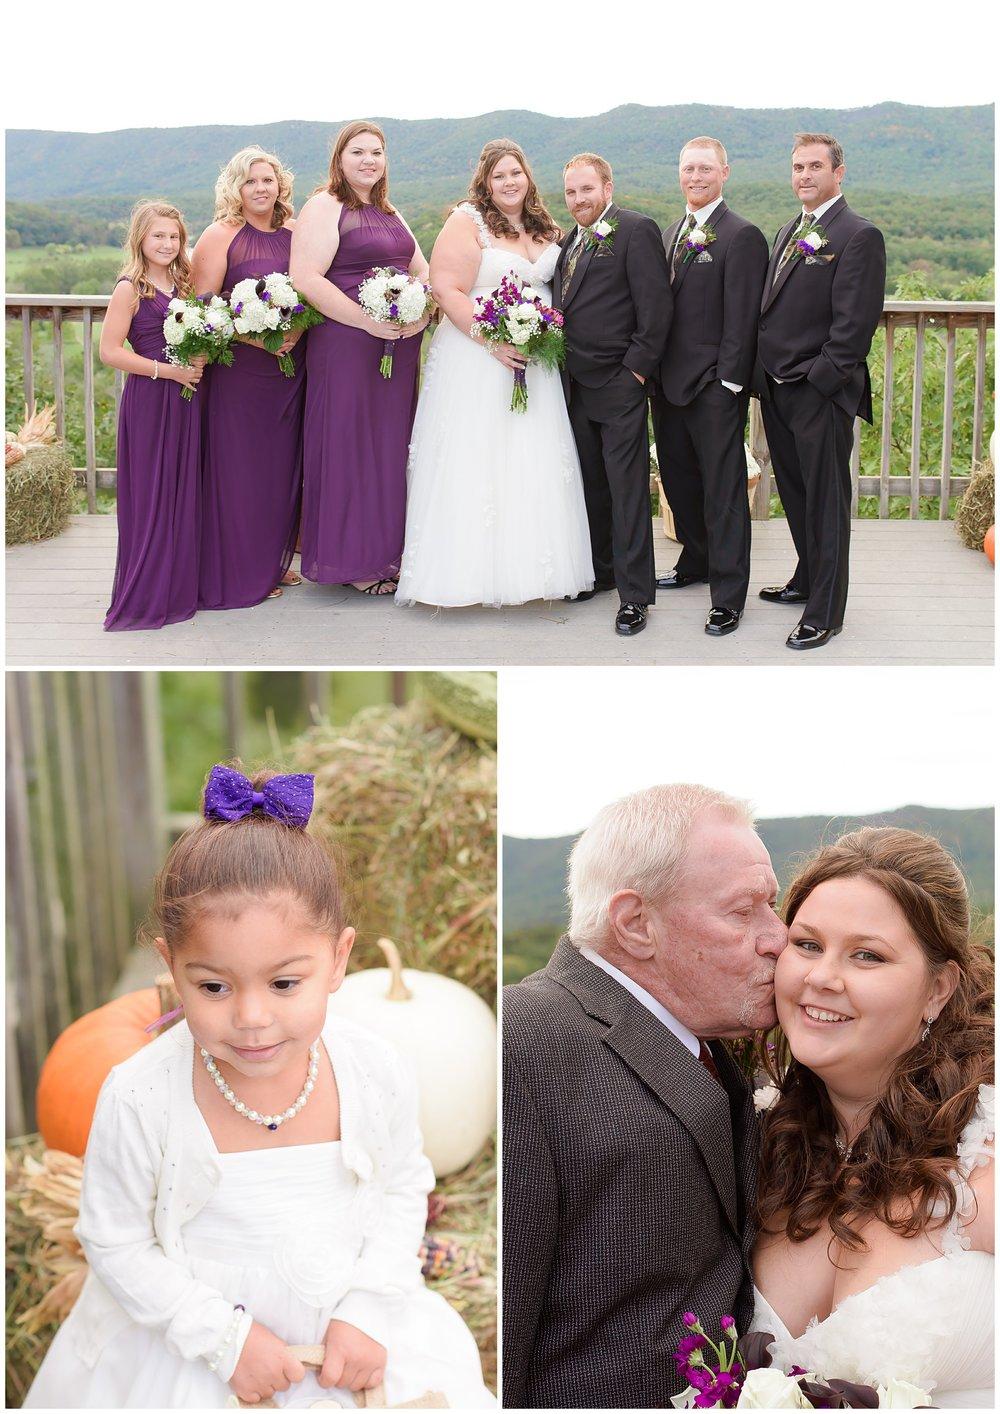 charleston south carolina wedding photographer eco friendly purple wedding colors luray virginia wedding mountains country45.jpg